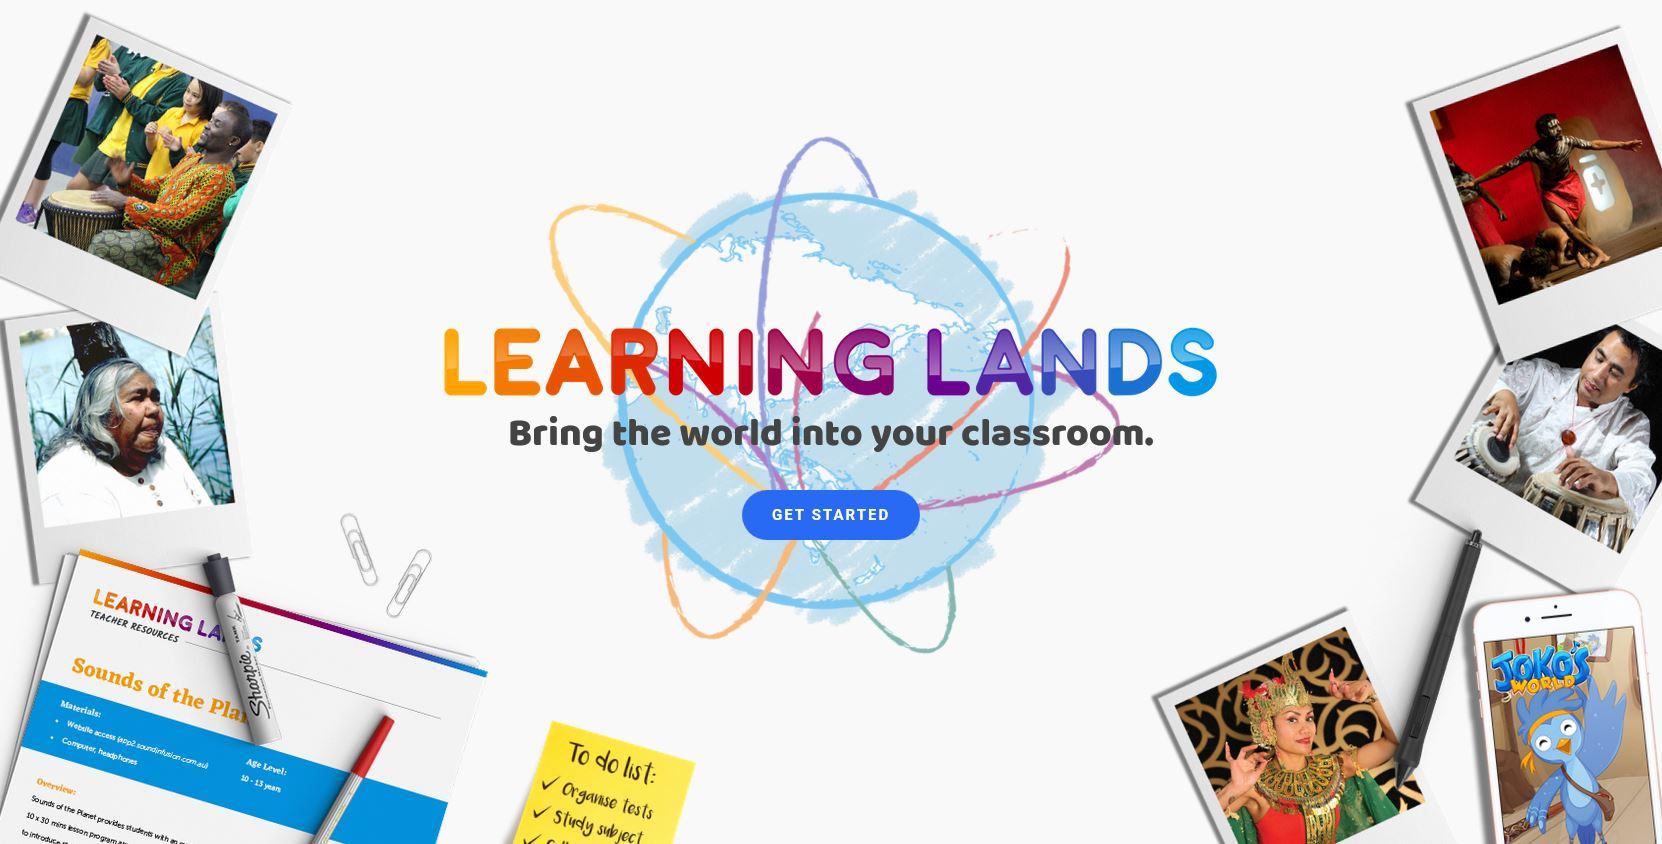 https://campaign-image.com/zohocampaigns/142749000010992094_zc_v37_learninglands.jpg